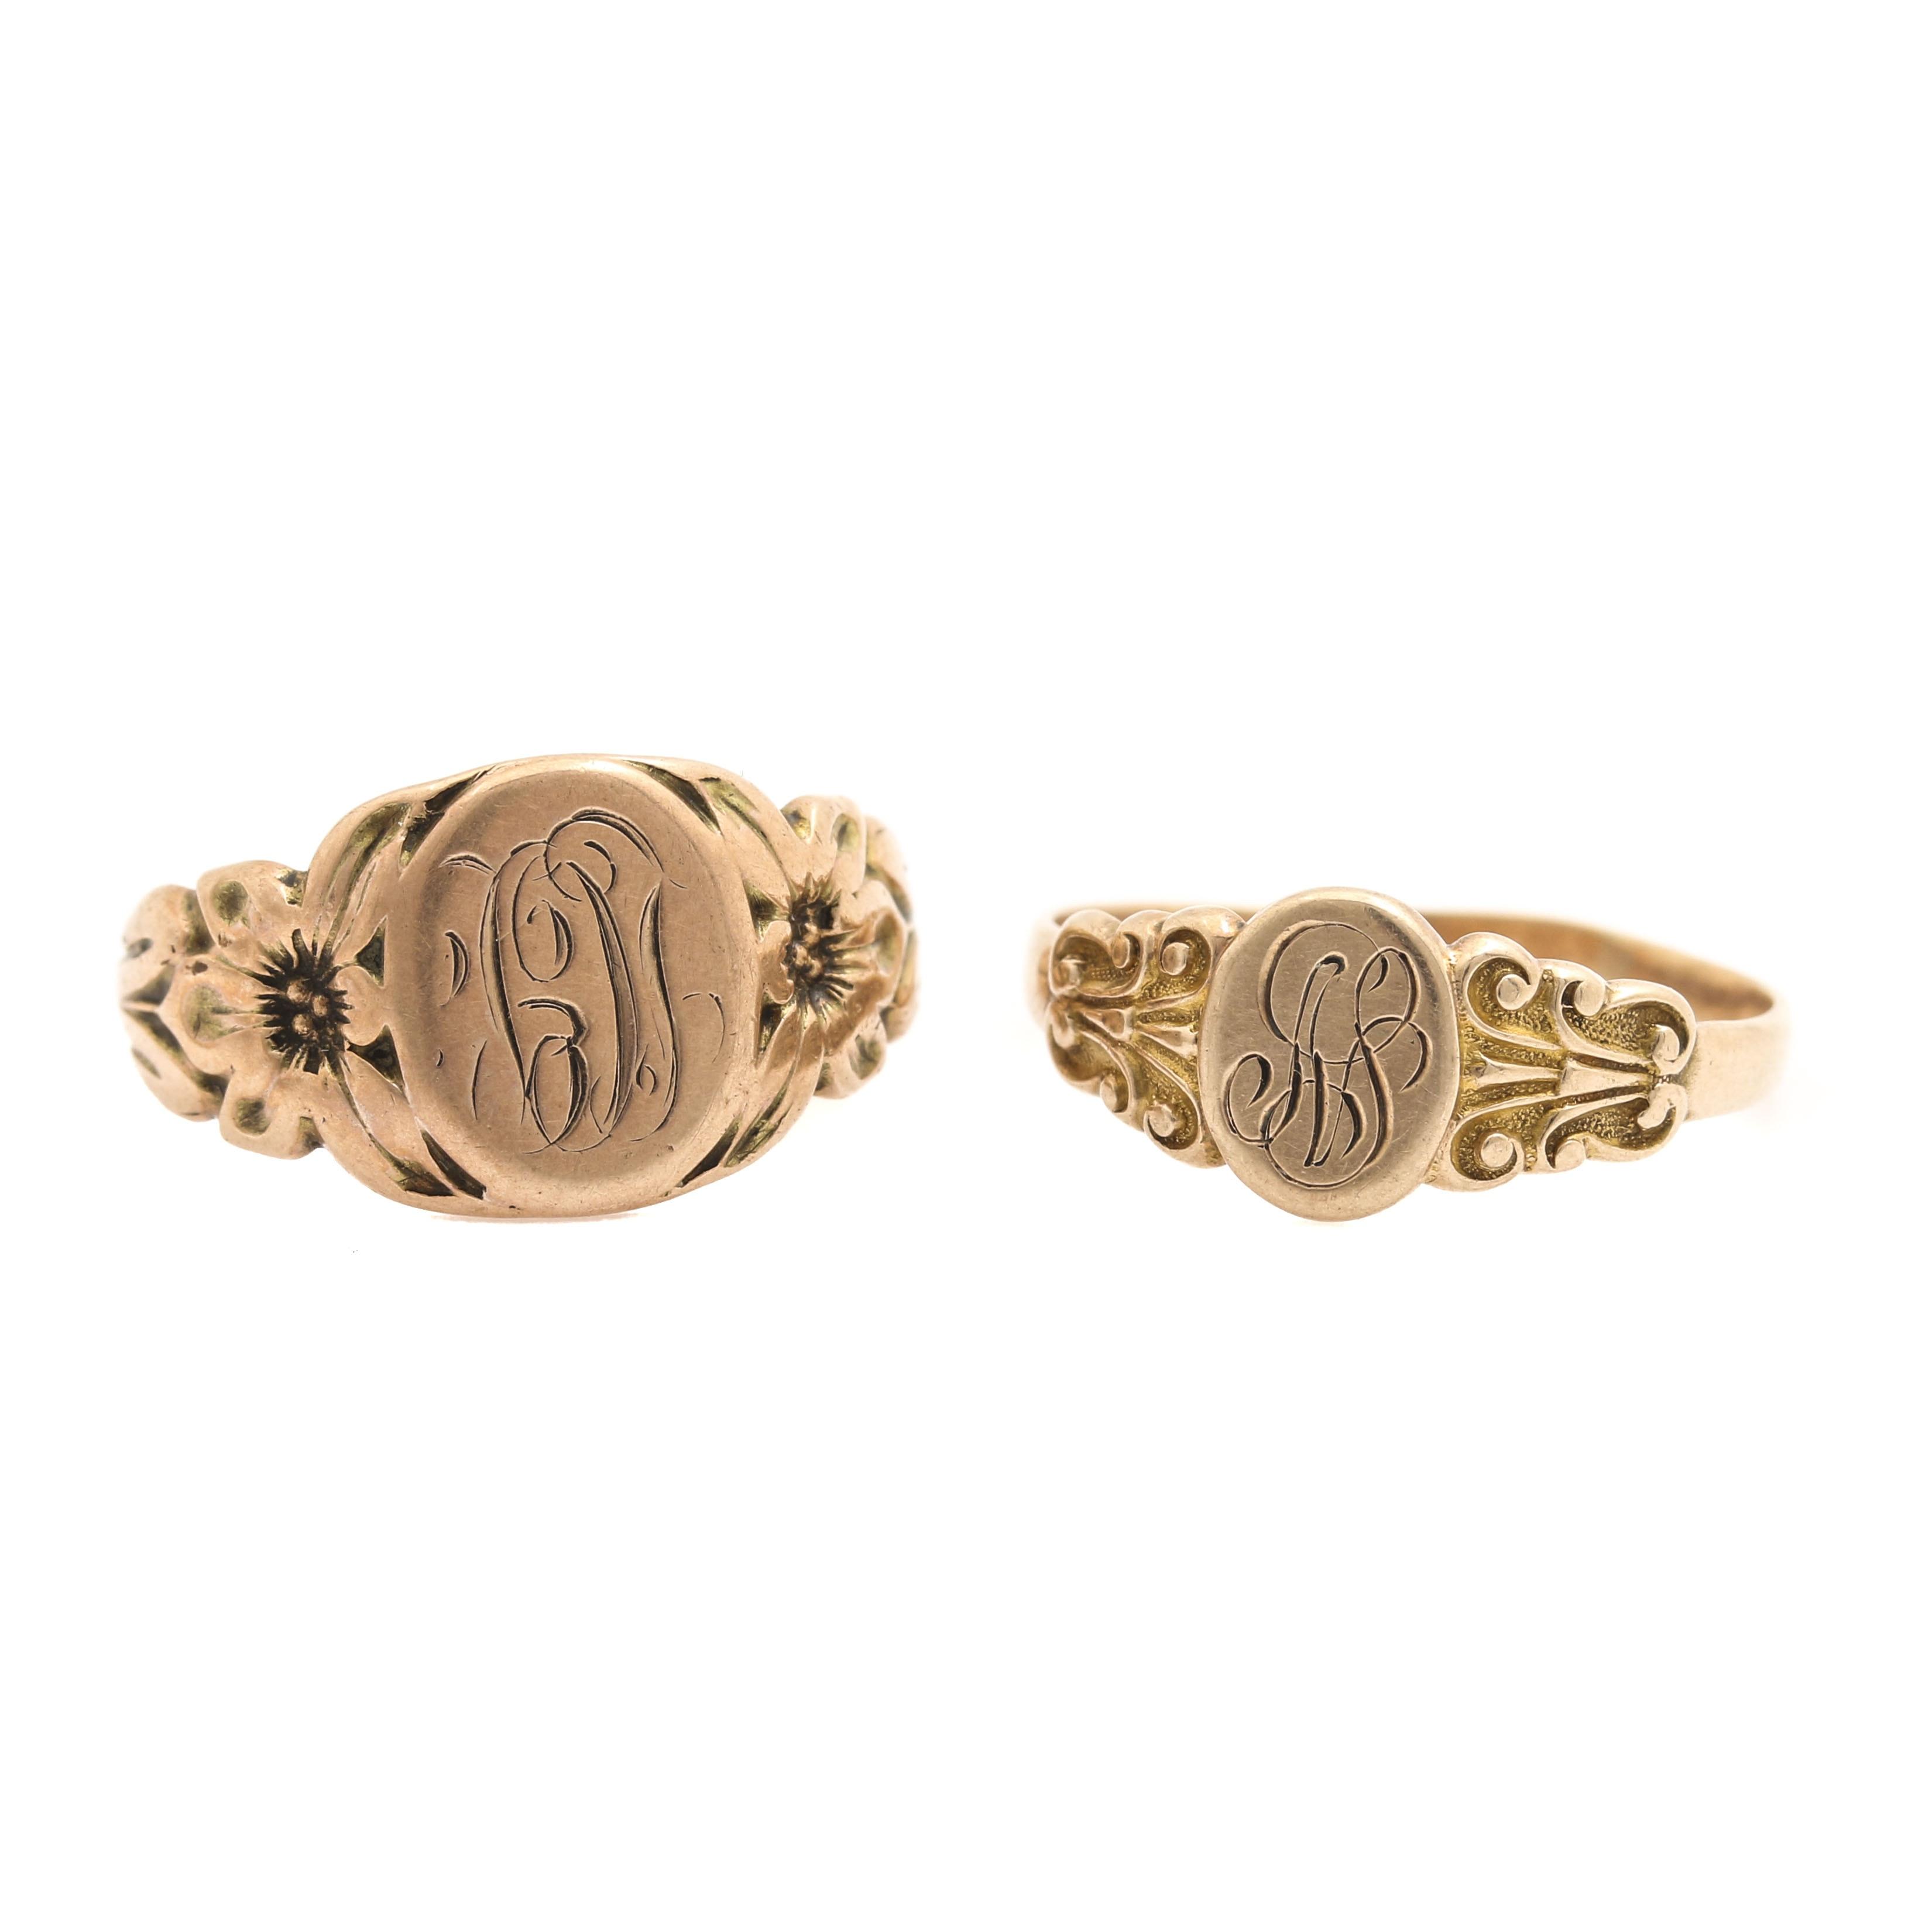 10K Yellow Gold Signet Ring Selection